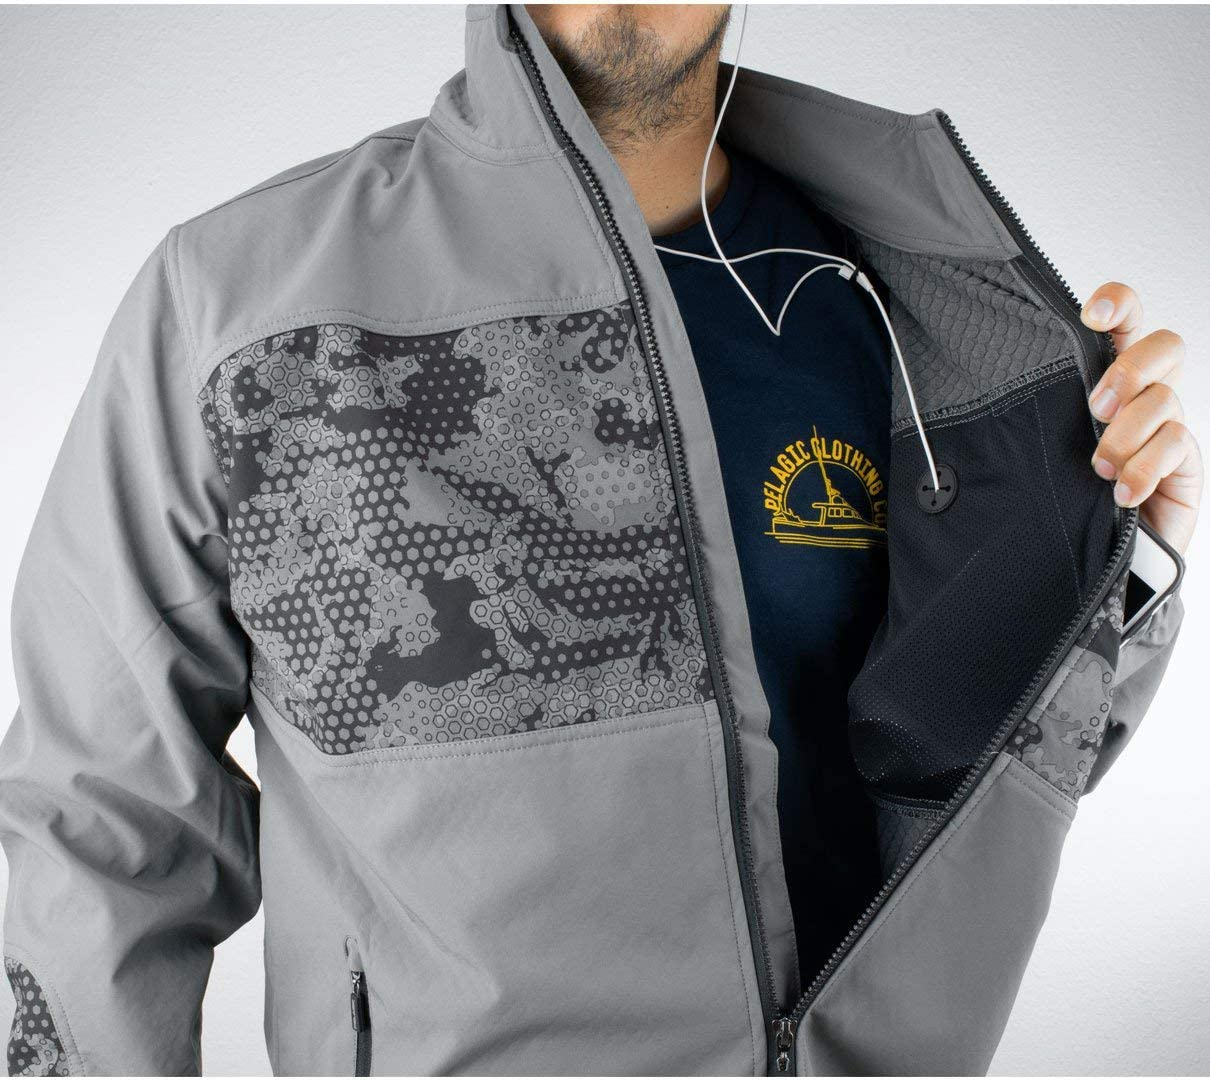 PELAGIC Insulator Soft Shell Jacket